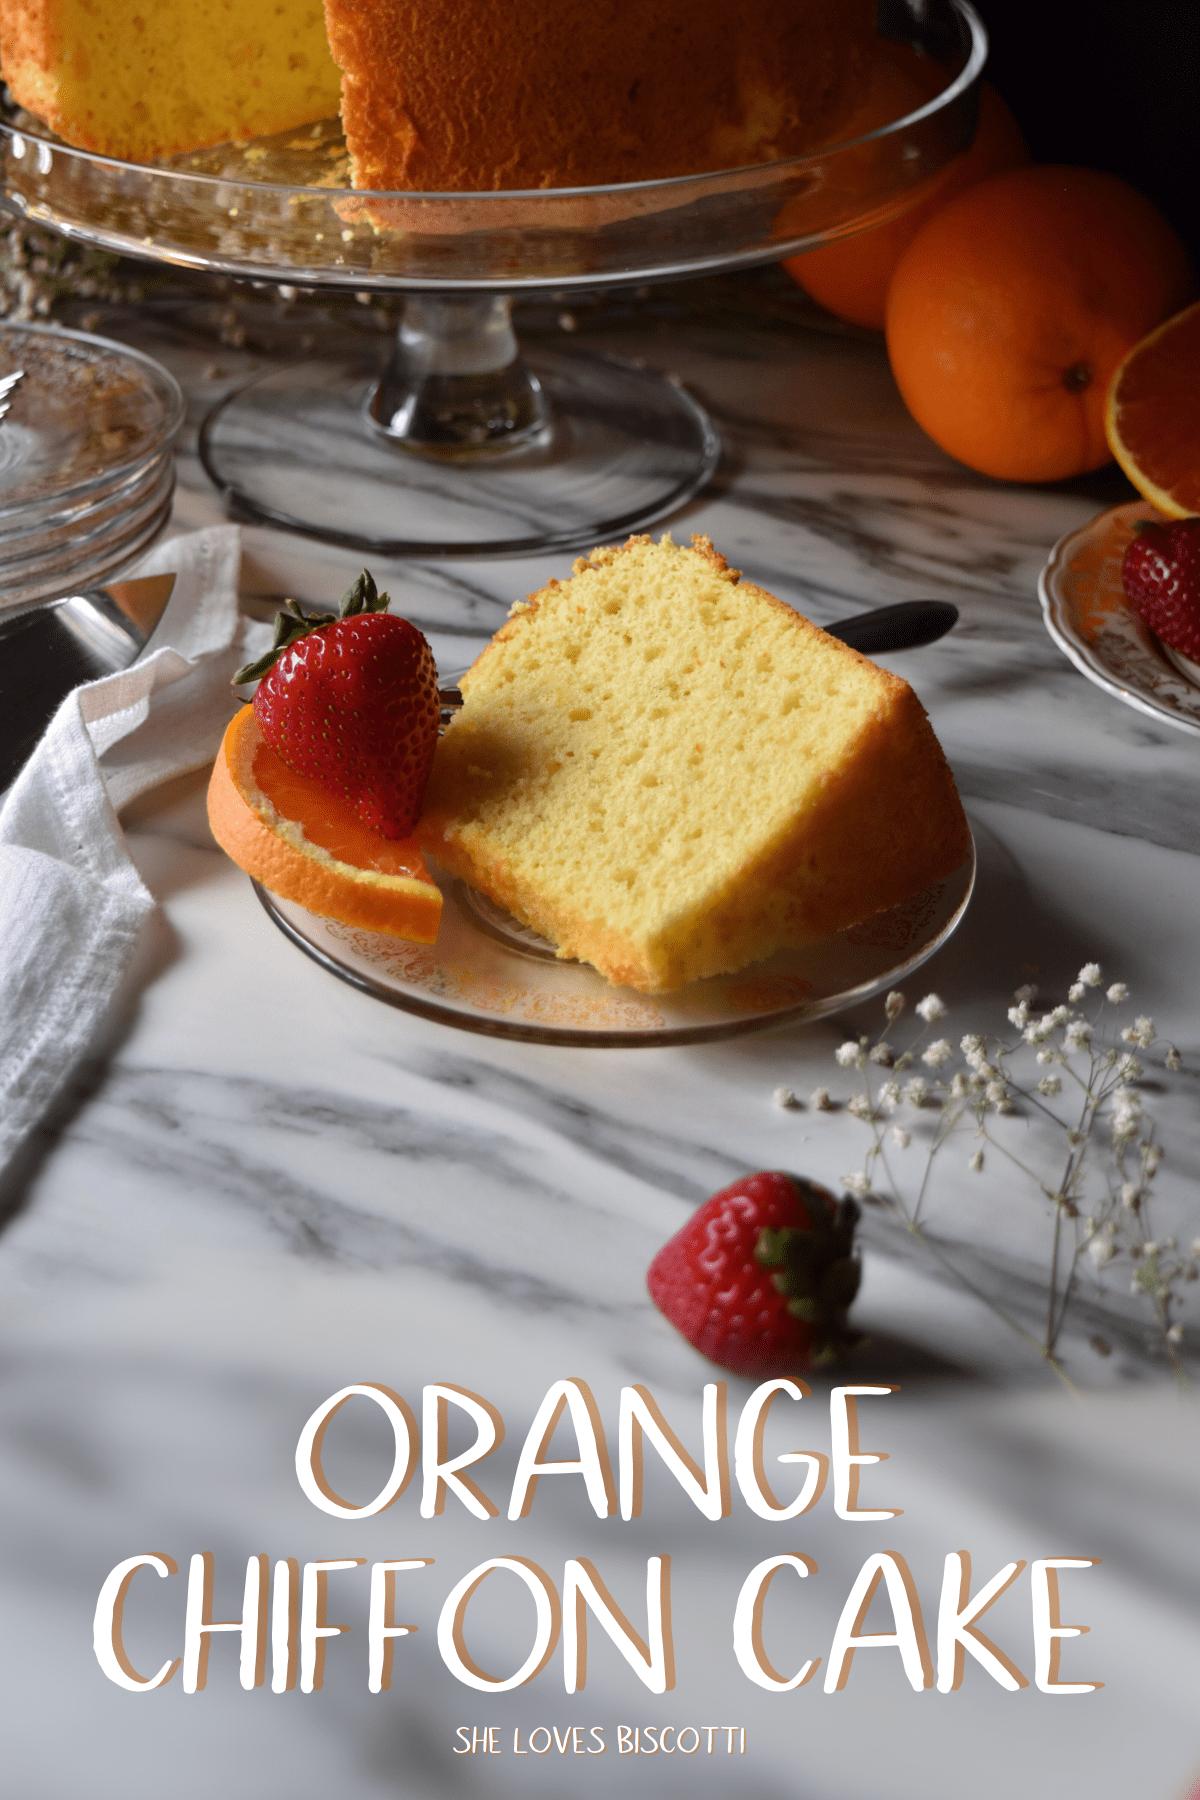 Orange Chiffon Cake || Orange Chiffon Cake Recipe || Orange Chiffon Cake Martha || Orange Chiffon Cake Easy #chiffoncake #orangechiffoncake #cakerecipe